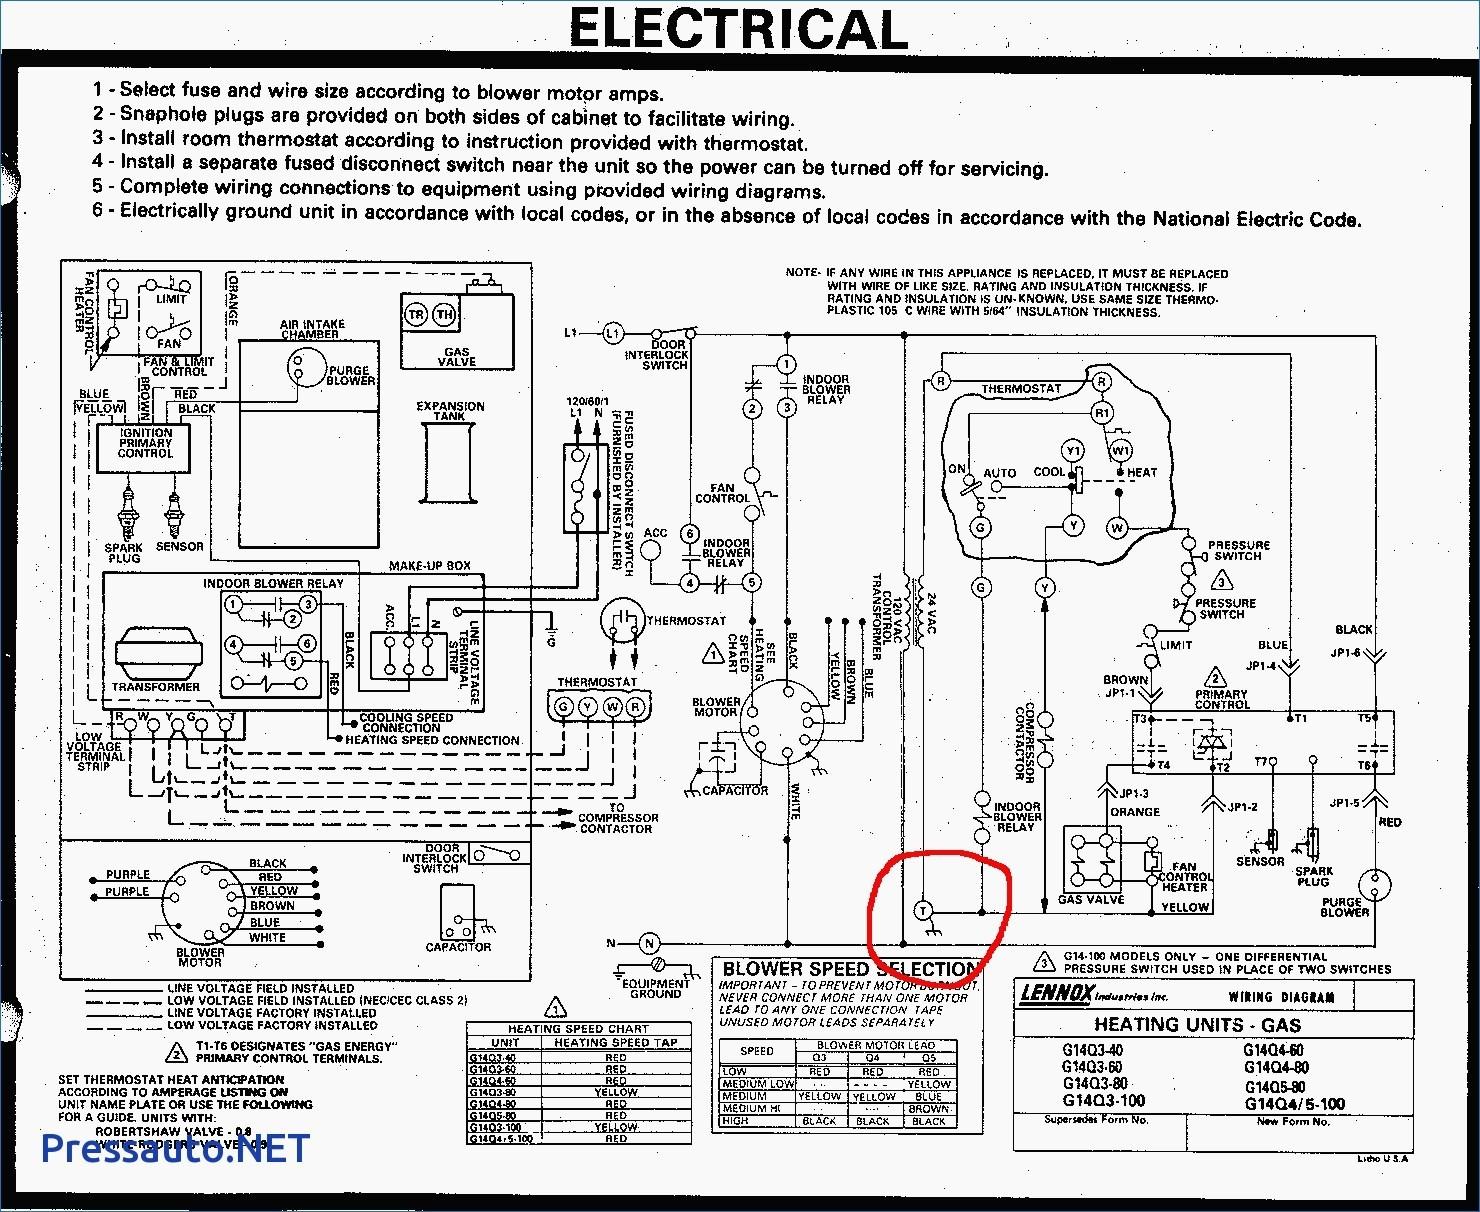 [XOTG_4463]  OZ_4268] Honeywell Heat Pump Wiring Diagram Get Free Image About Wiring  Download Diagram | Delux 80 Ruud Furnace Wiring Diagram |  | Eatte Dadea Ophag Semec Mohammedshrine Librar Wiring 101